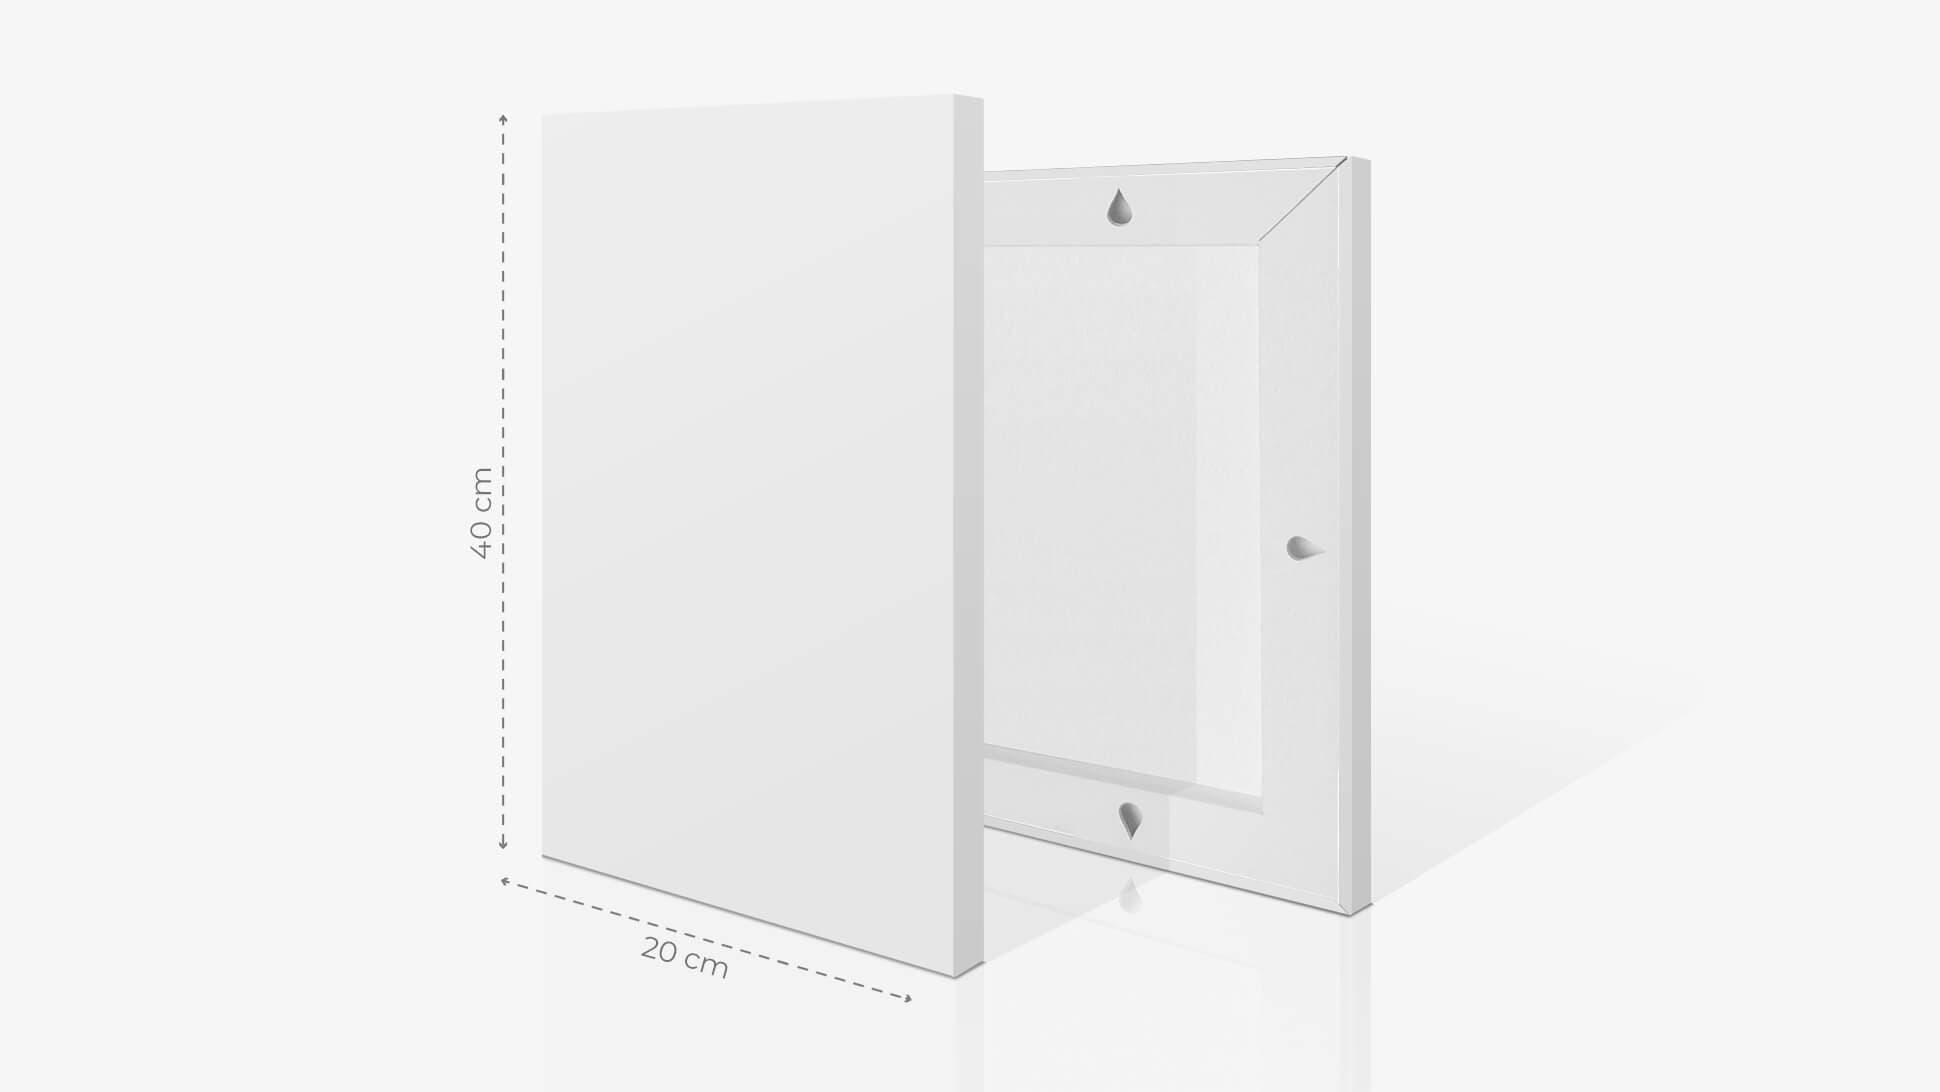 Fotoquadro 20x40 cm | tictac.it